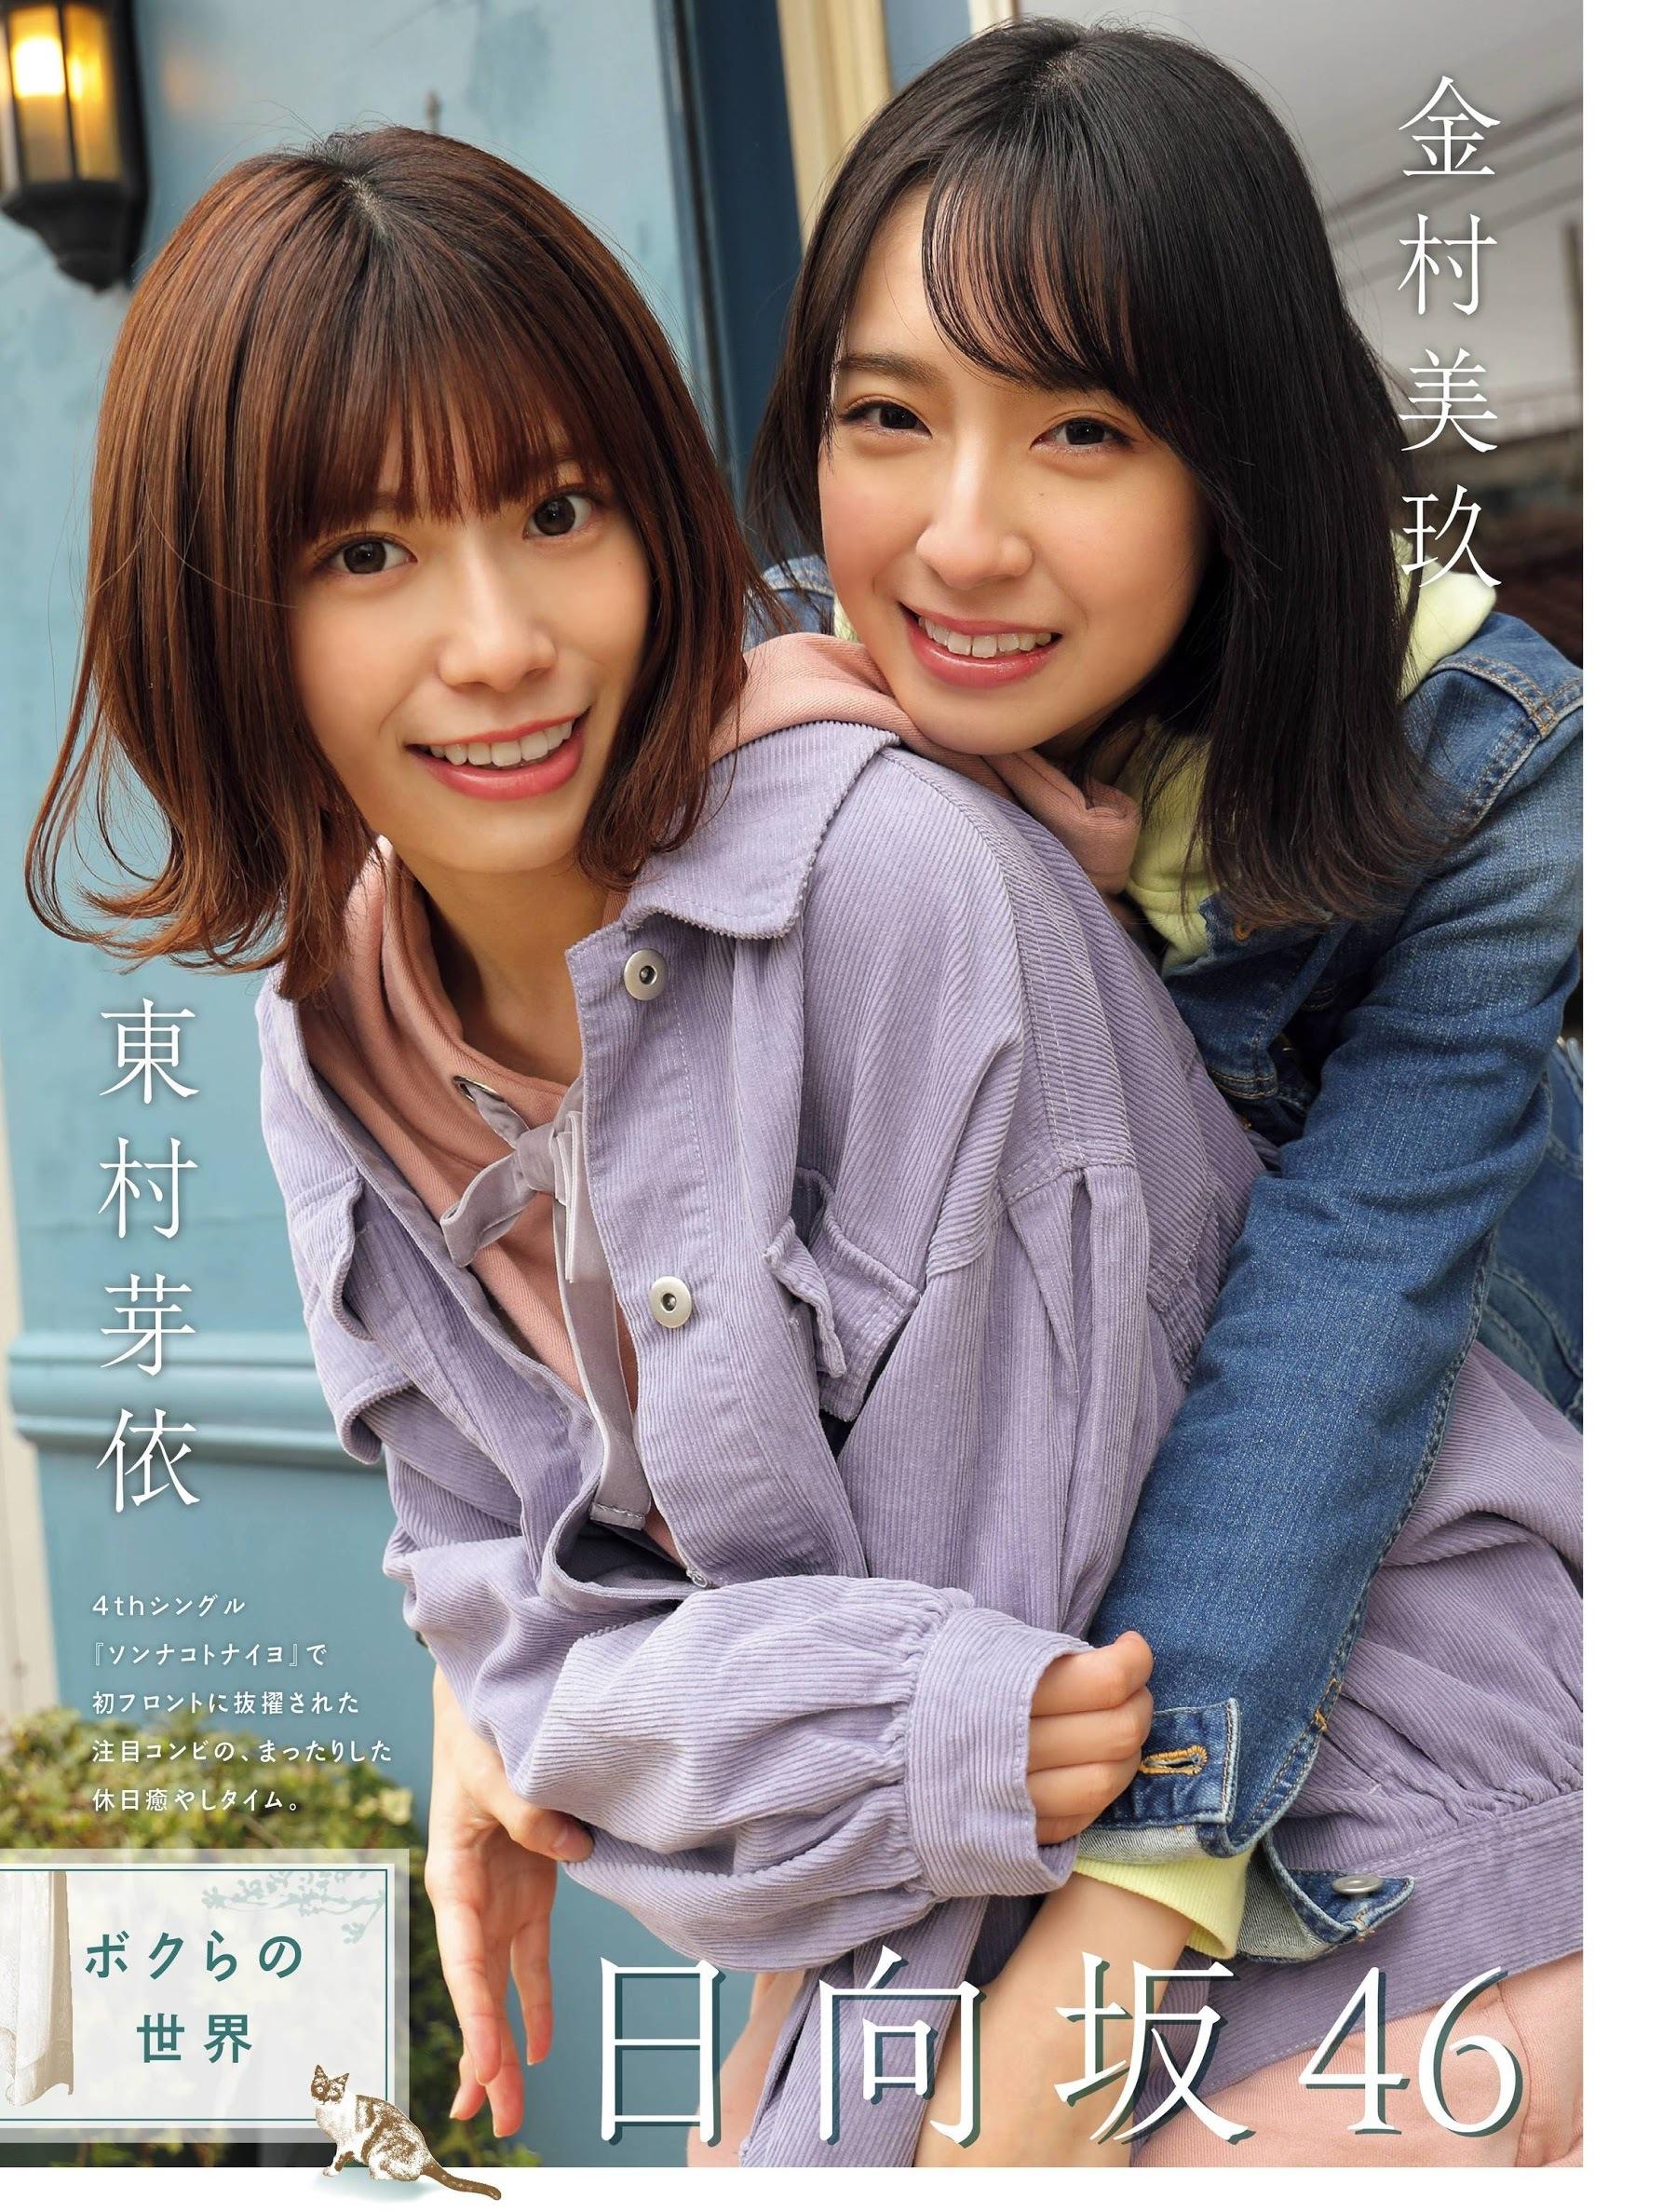 Hyugazaka 46 Higashimura Megumi Kanamura Miyu001